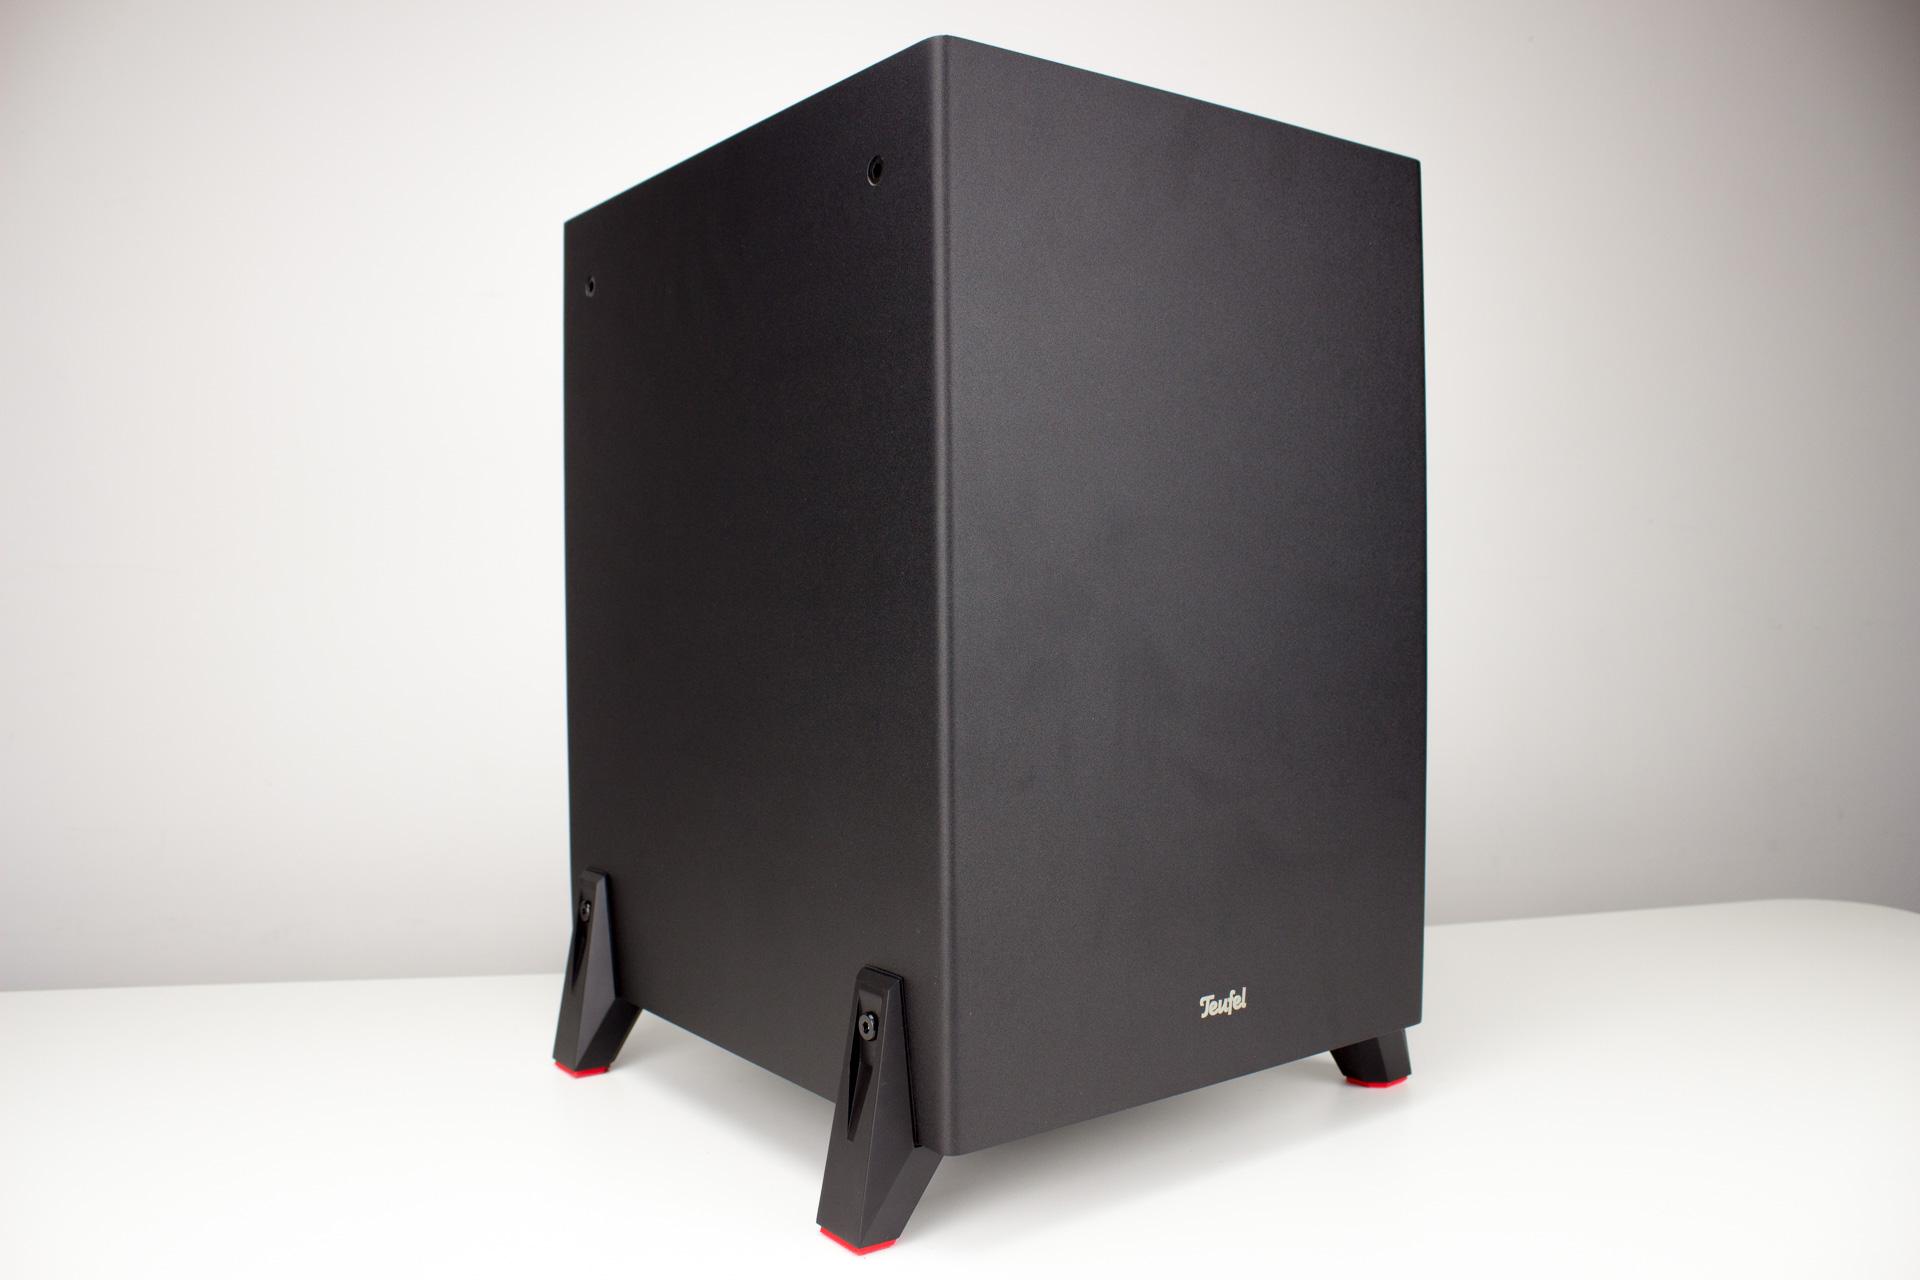 teufel heimkino ohne kabel neue teufel gadgets f r. Black Bedroom Furniture Sets. Home Design Ideas